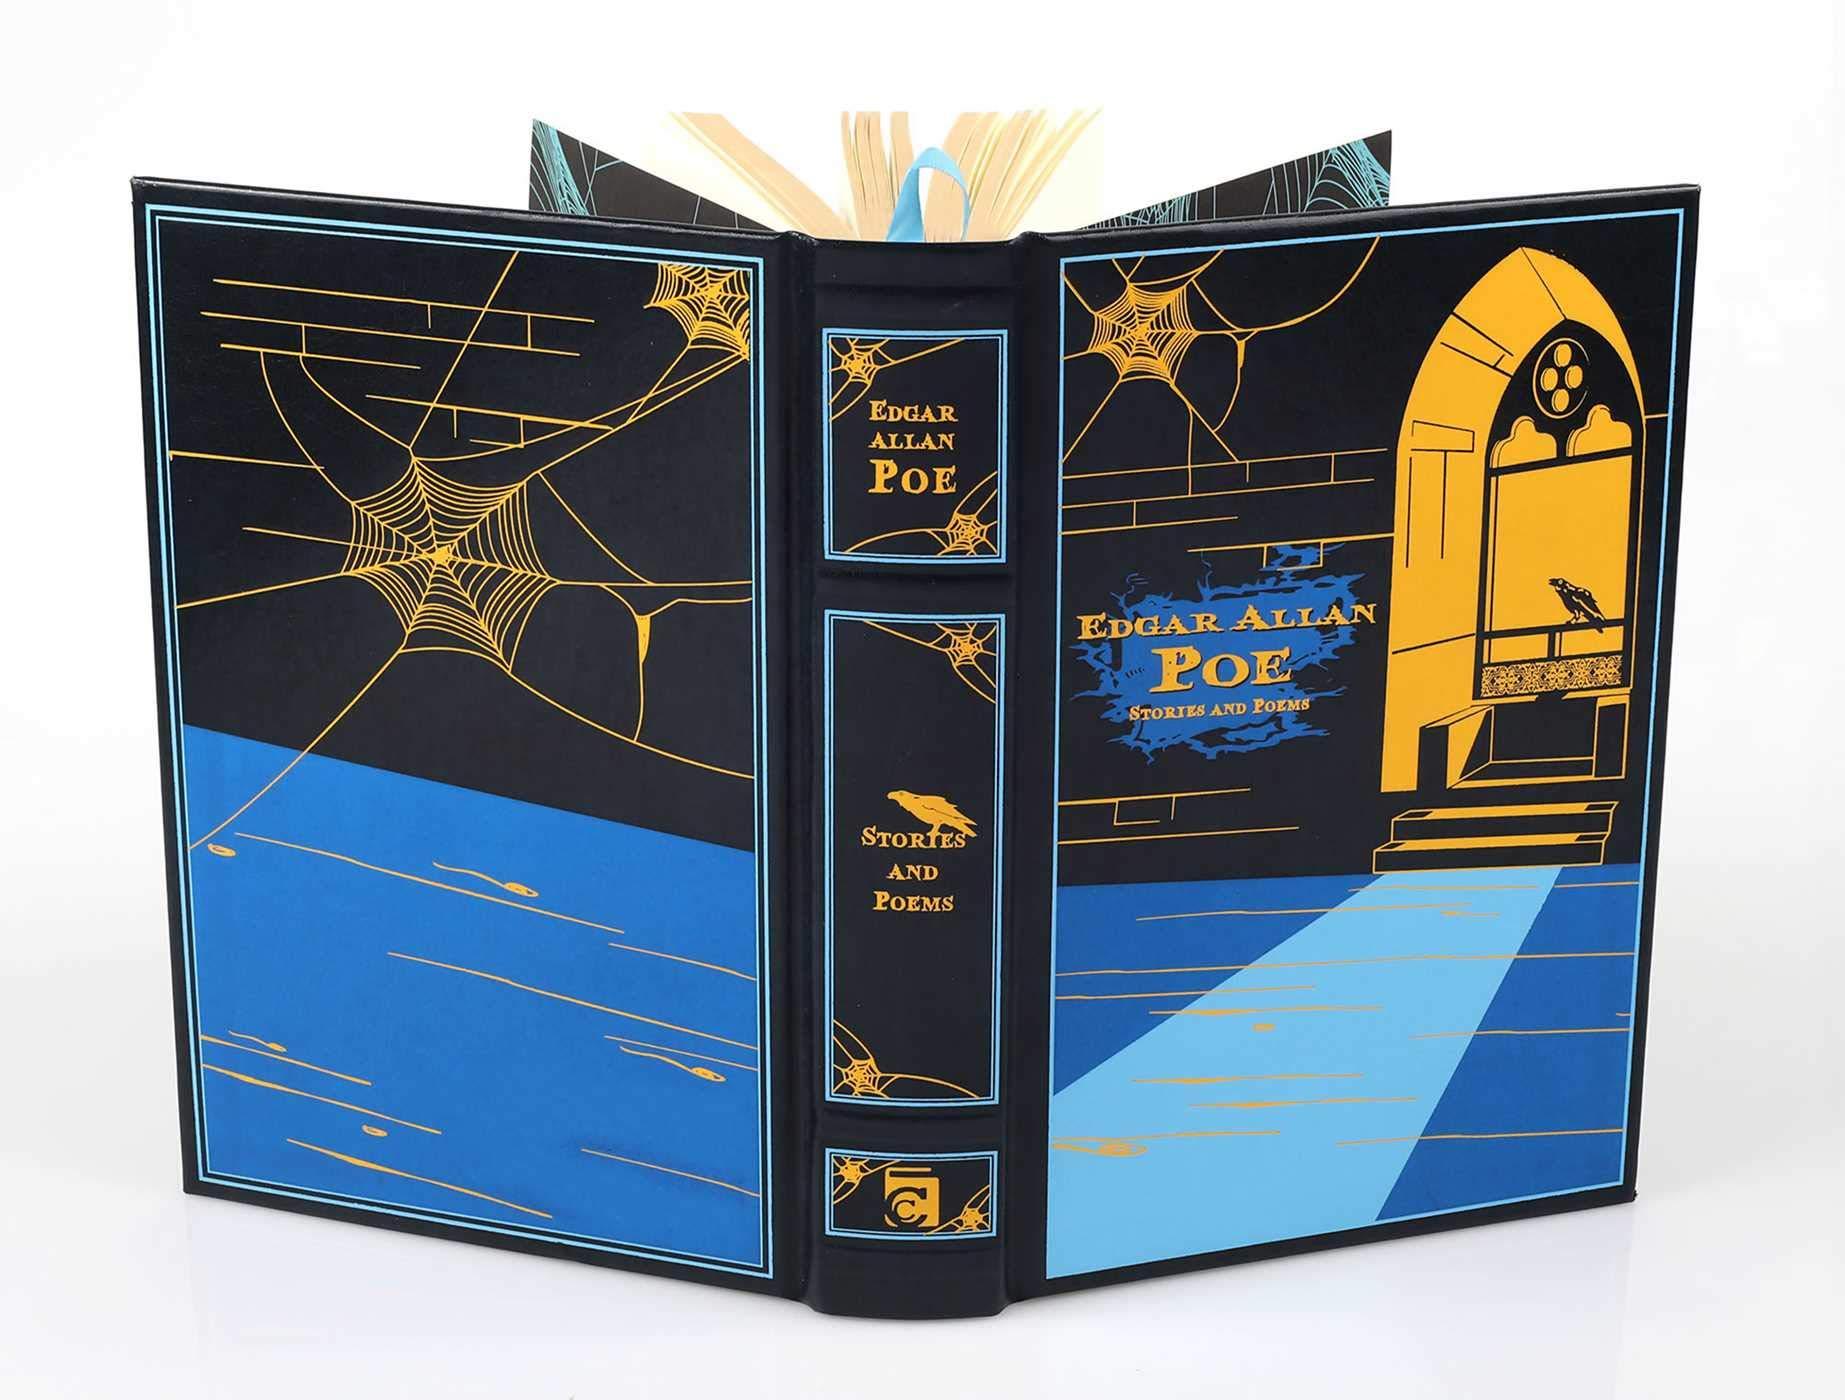 Edgar Allan Poe: Collected Works (Leather-bound Classics): Amazon.co.uk: Poe,  Edgar Allan, Odasso, Adrienne J.: 9781607103141: Books